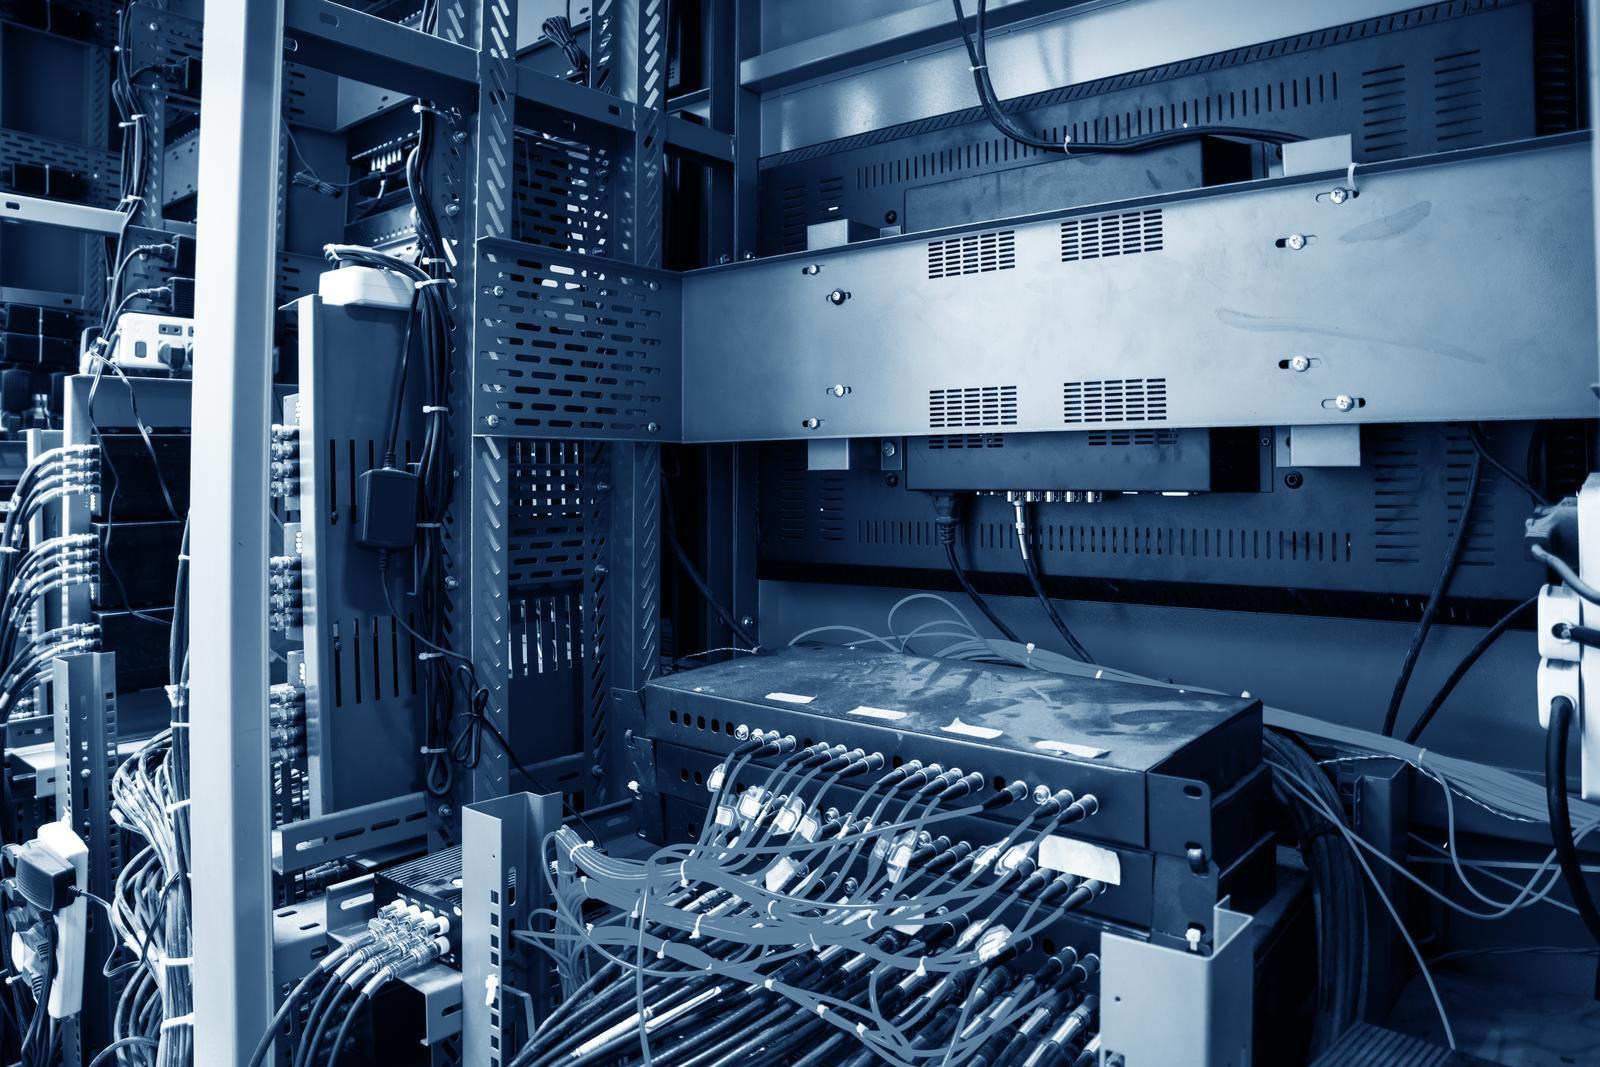 Computer facilities management activities in Tallinn